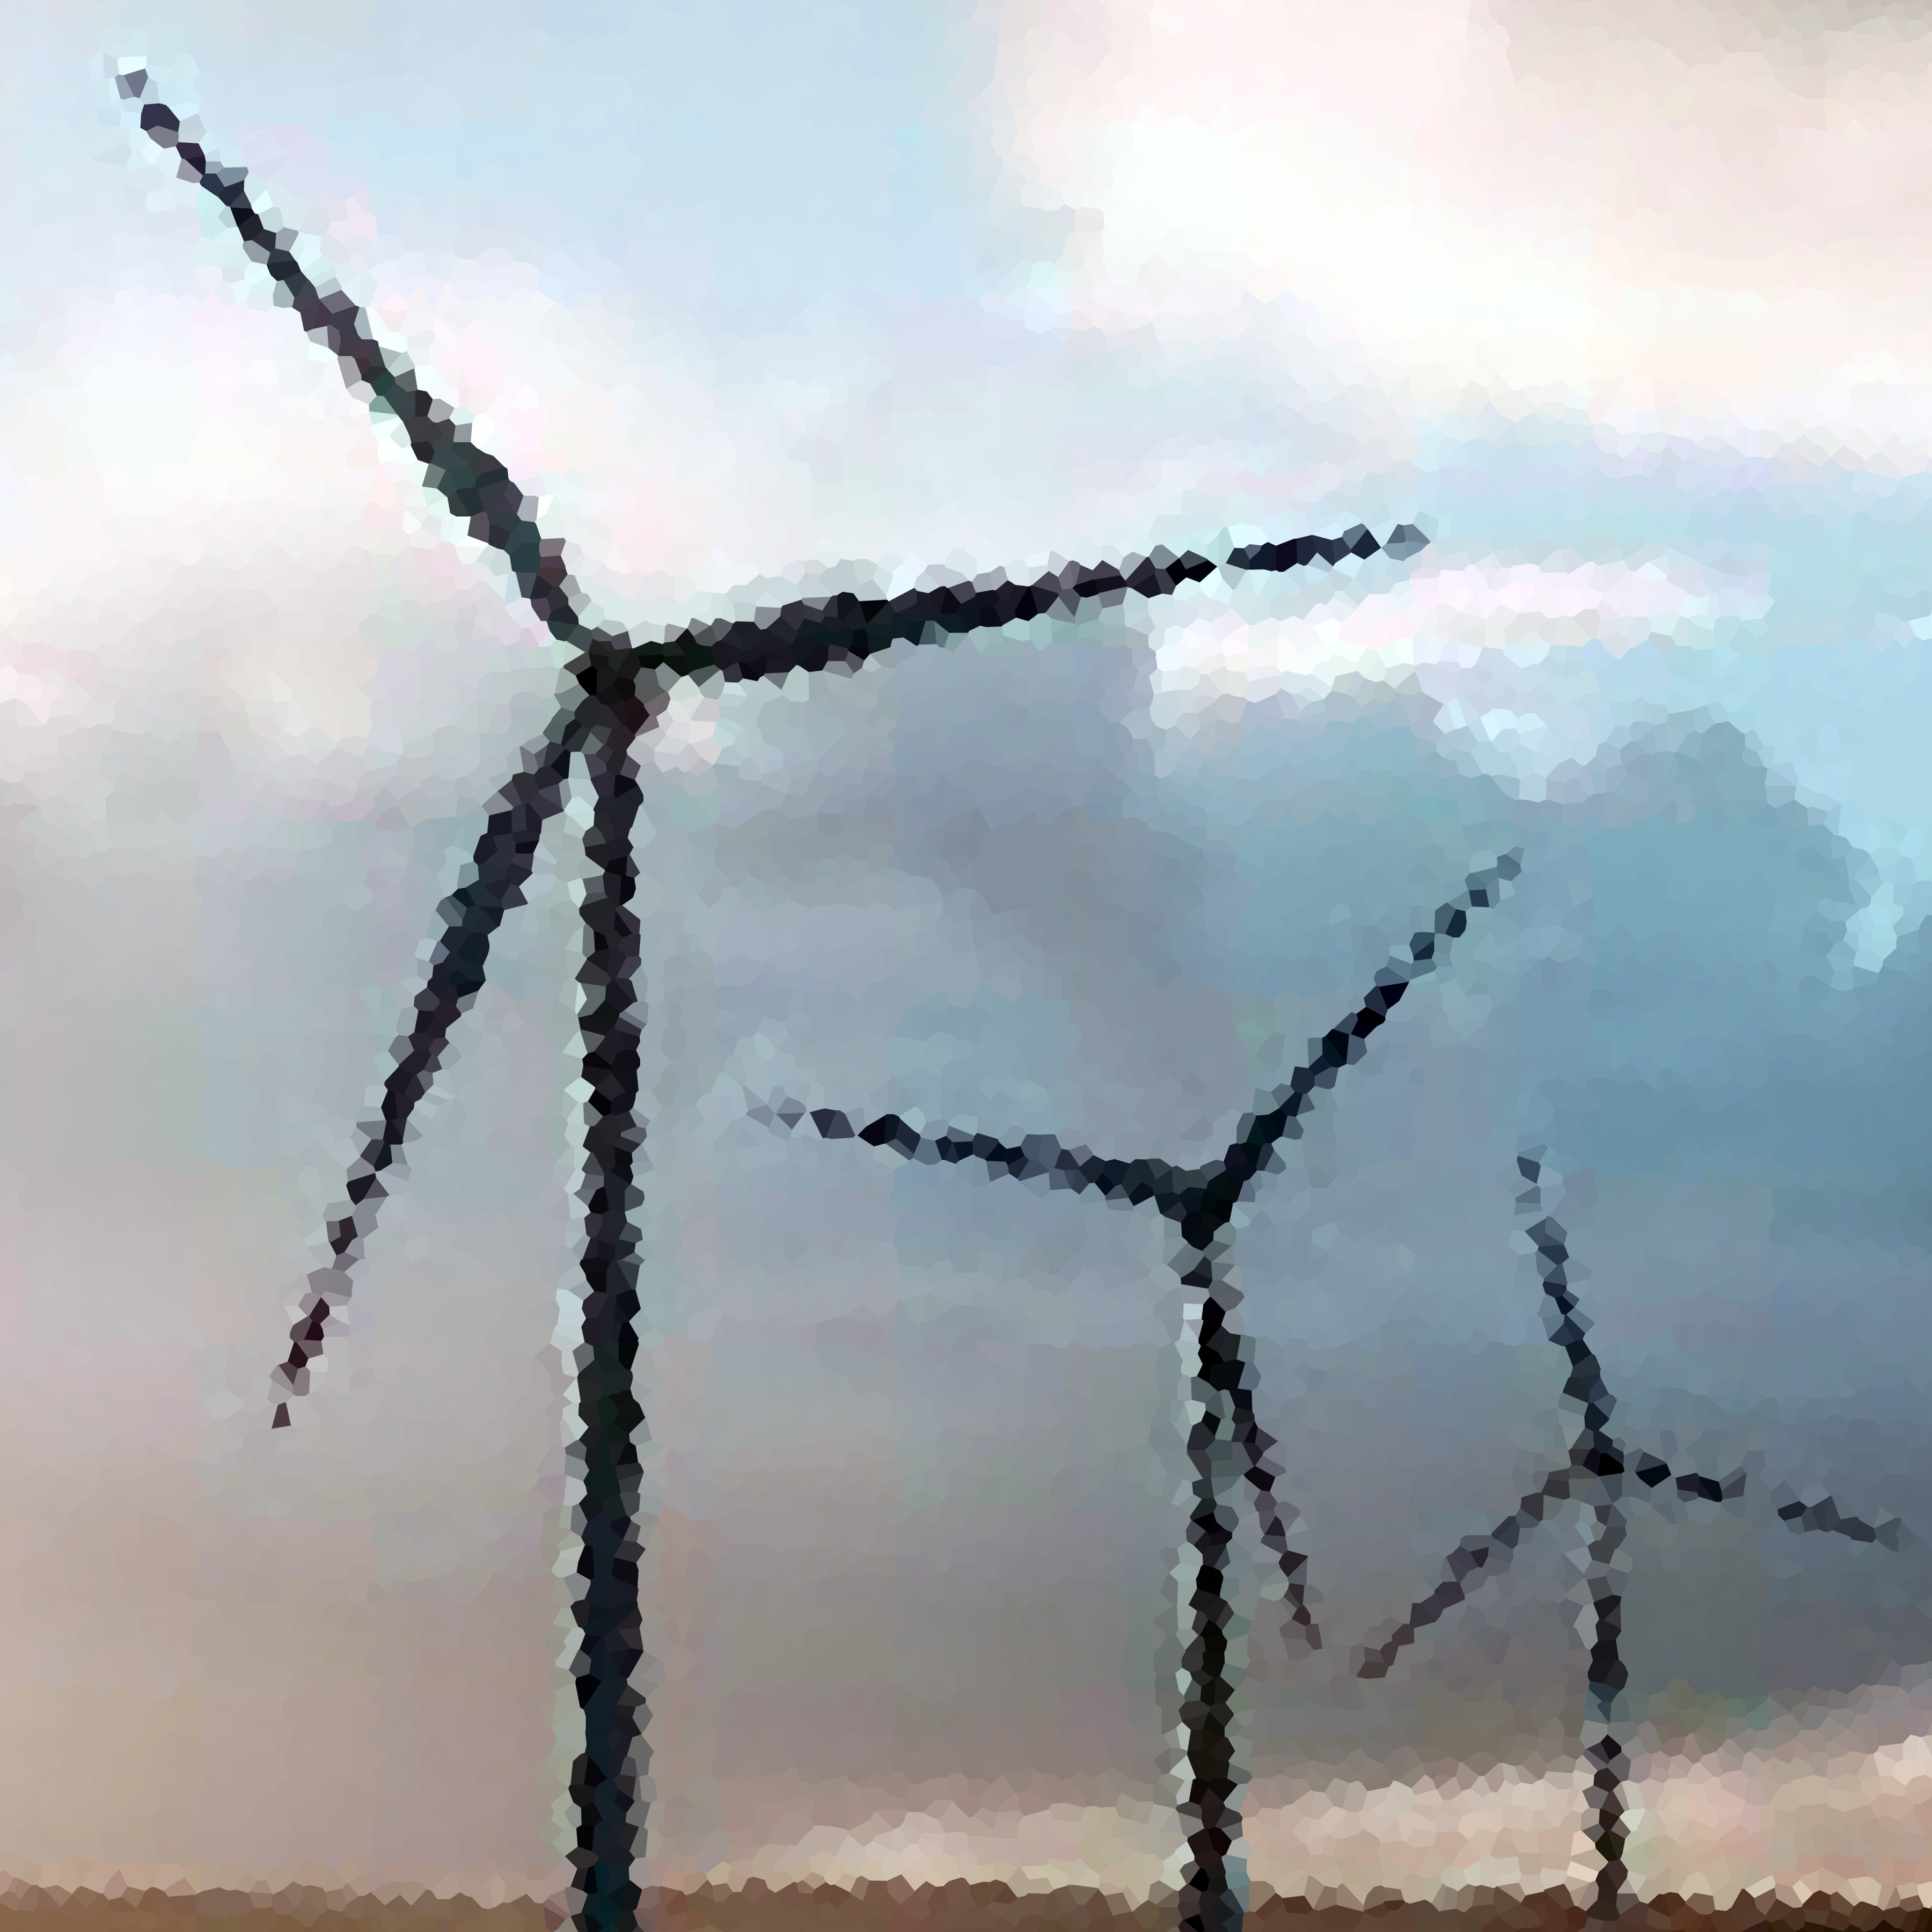 Turbine 6